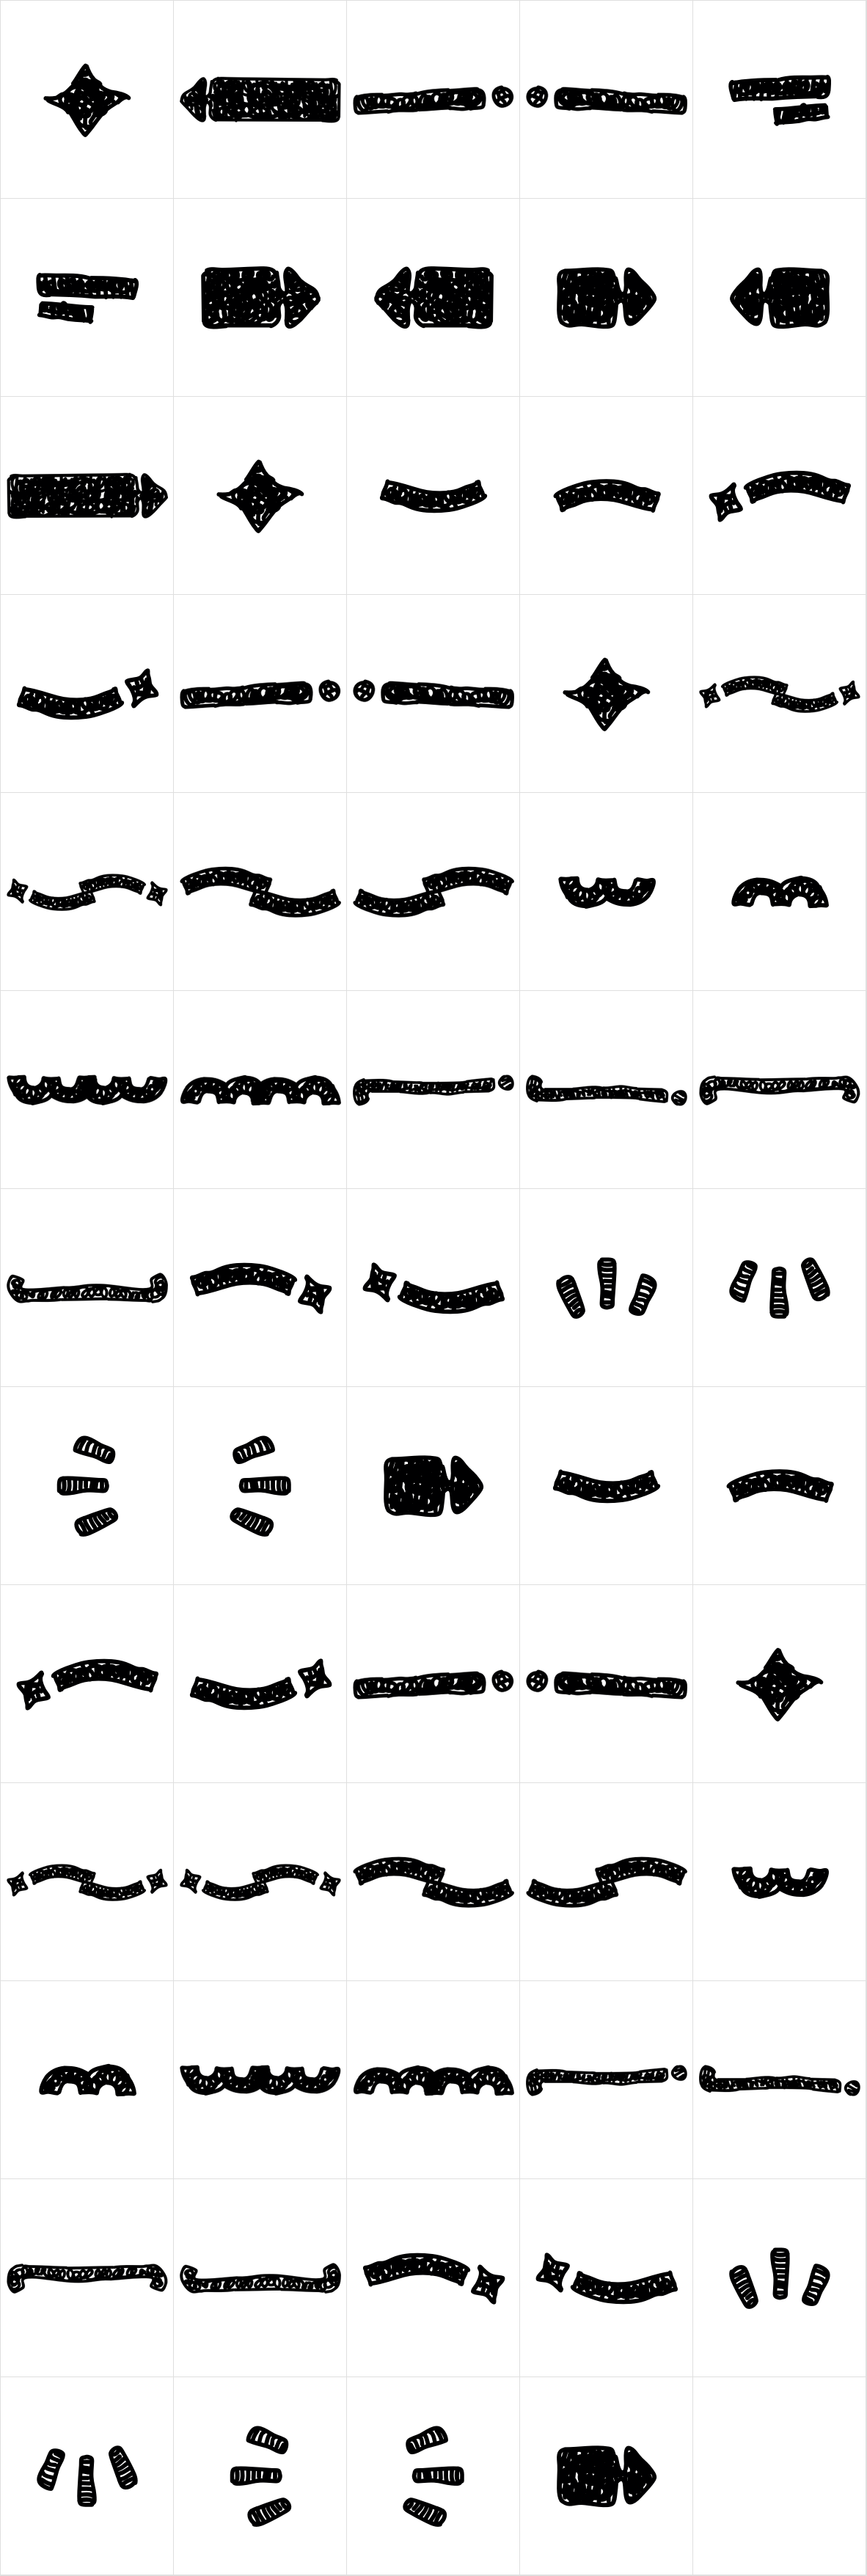 Tobi Greek Cyrillic Extra Hand